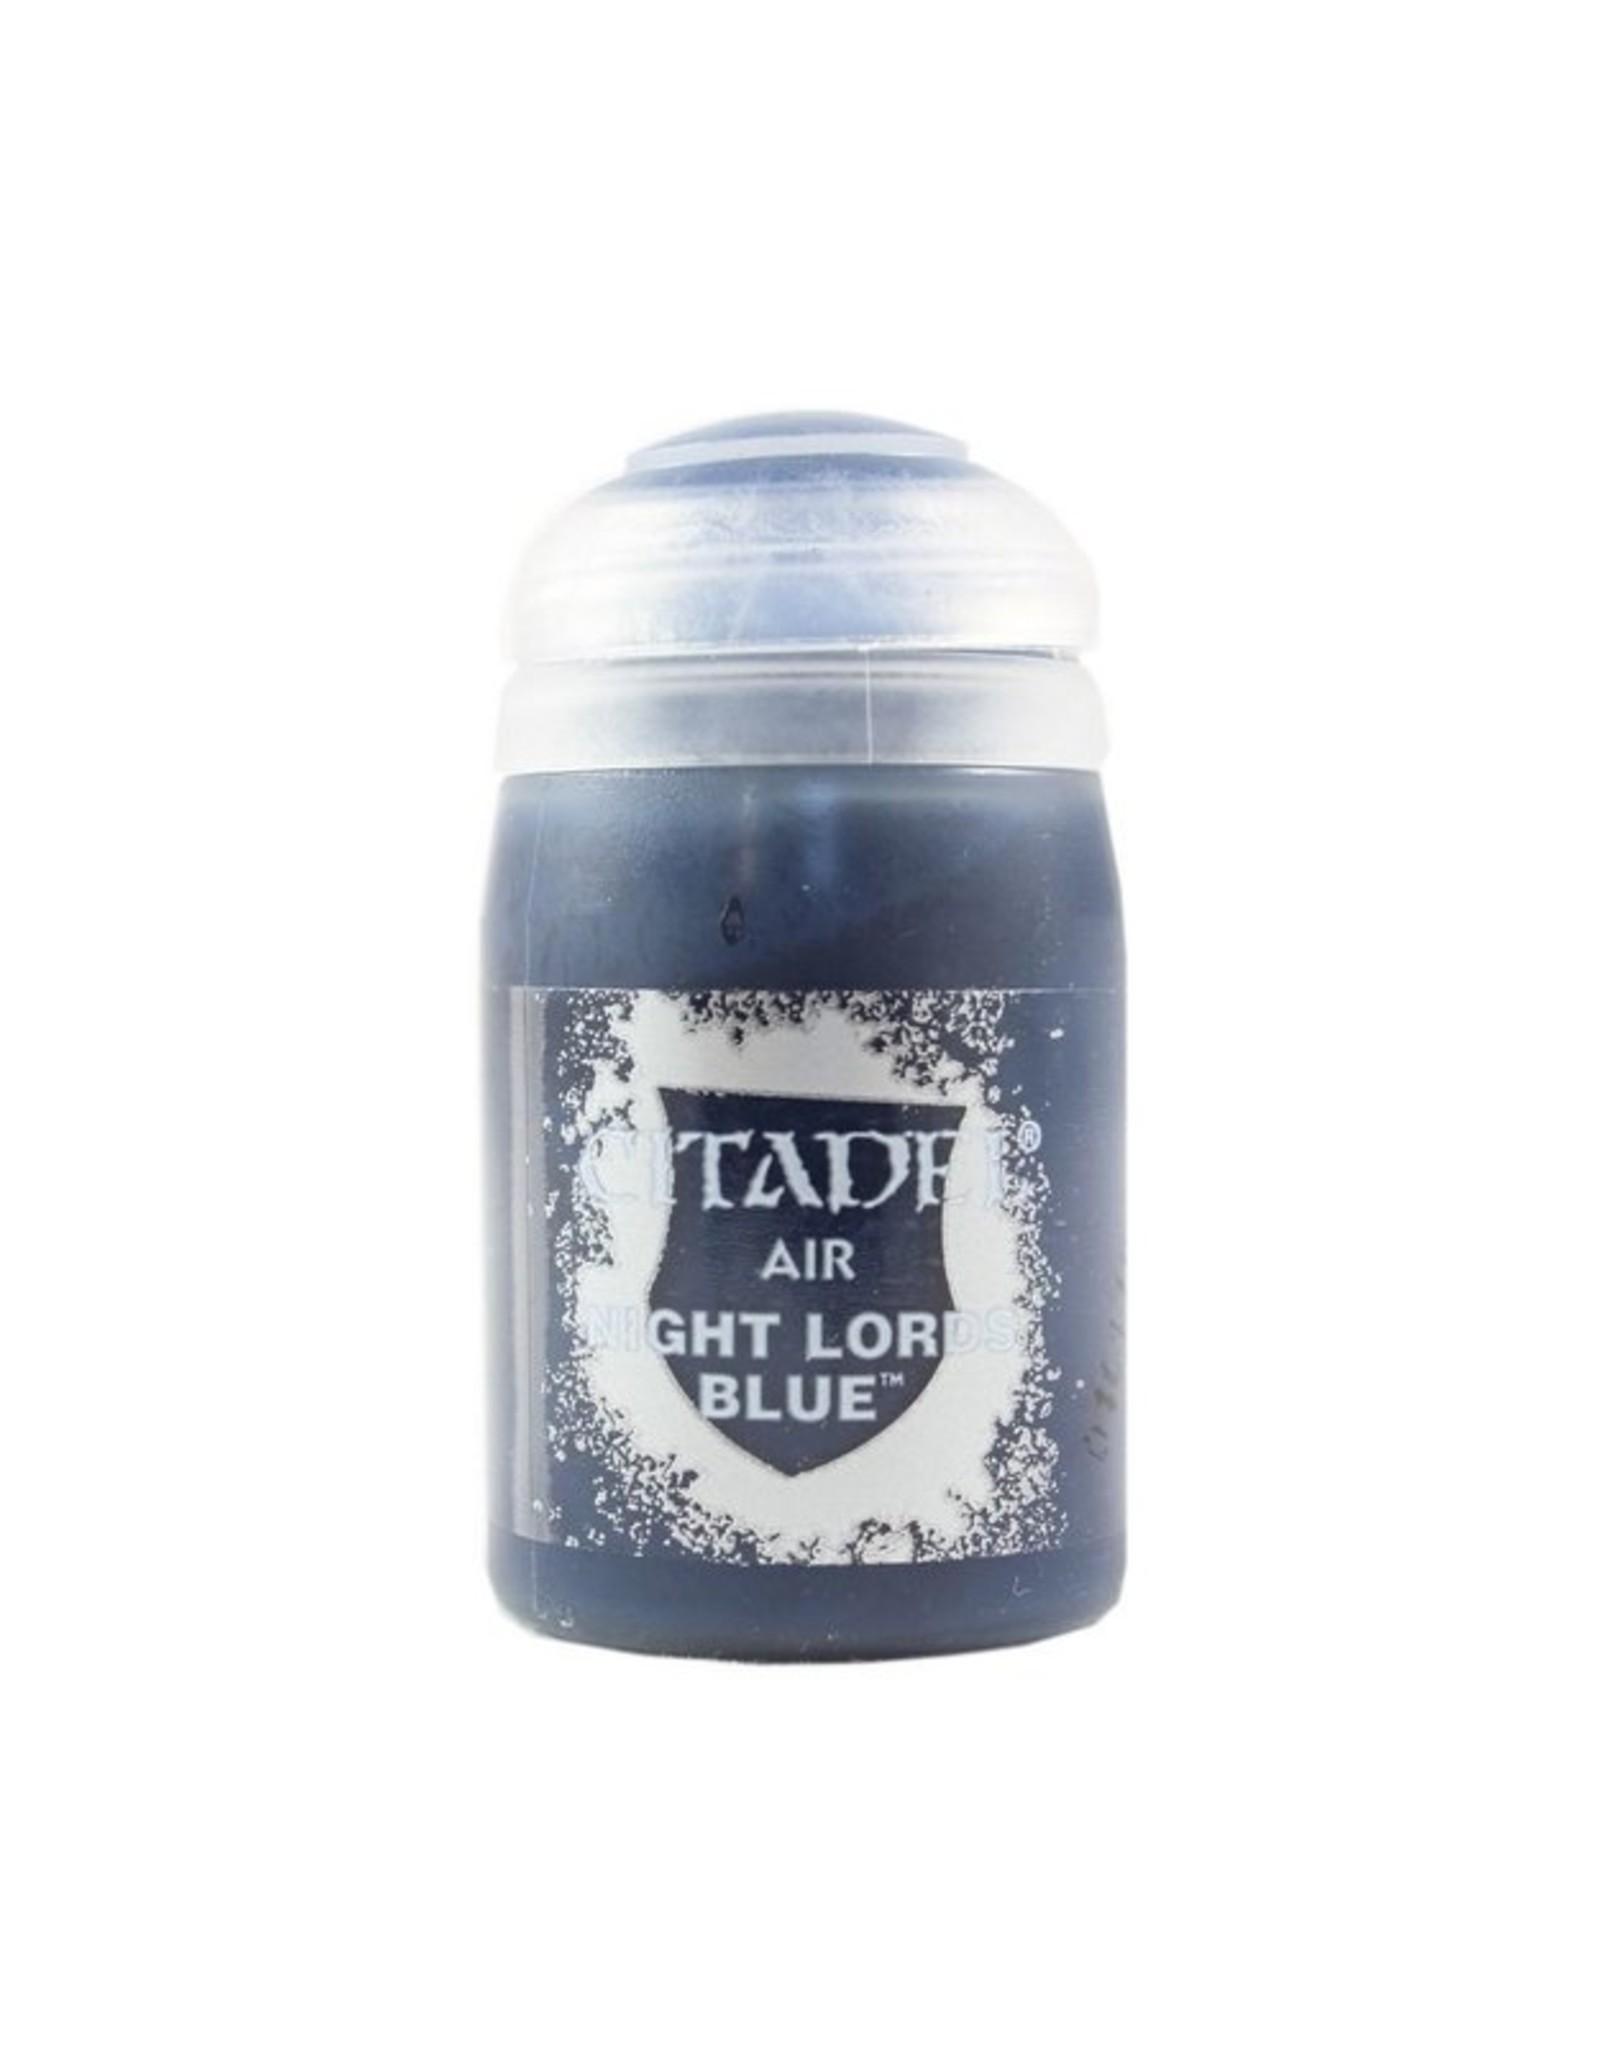 Citadel Citadel Air: Night Lords Blue (24ml)